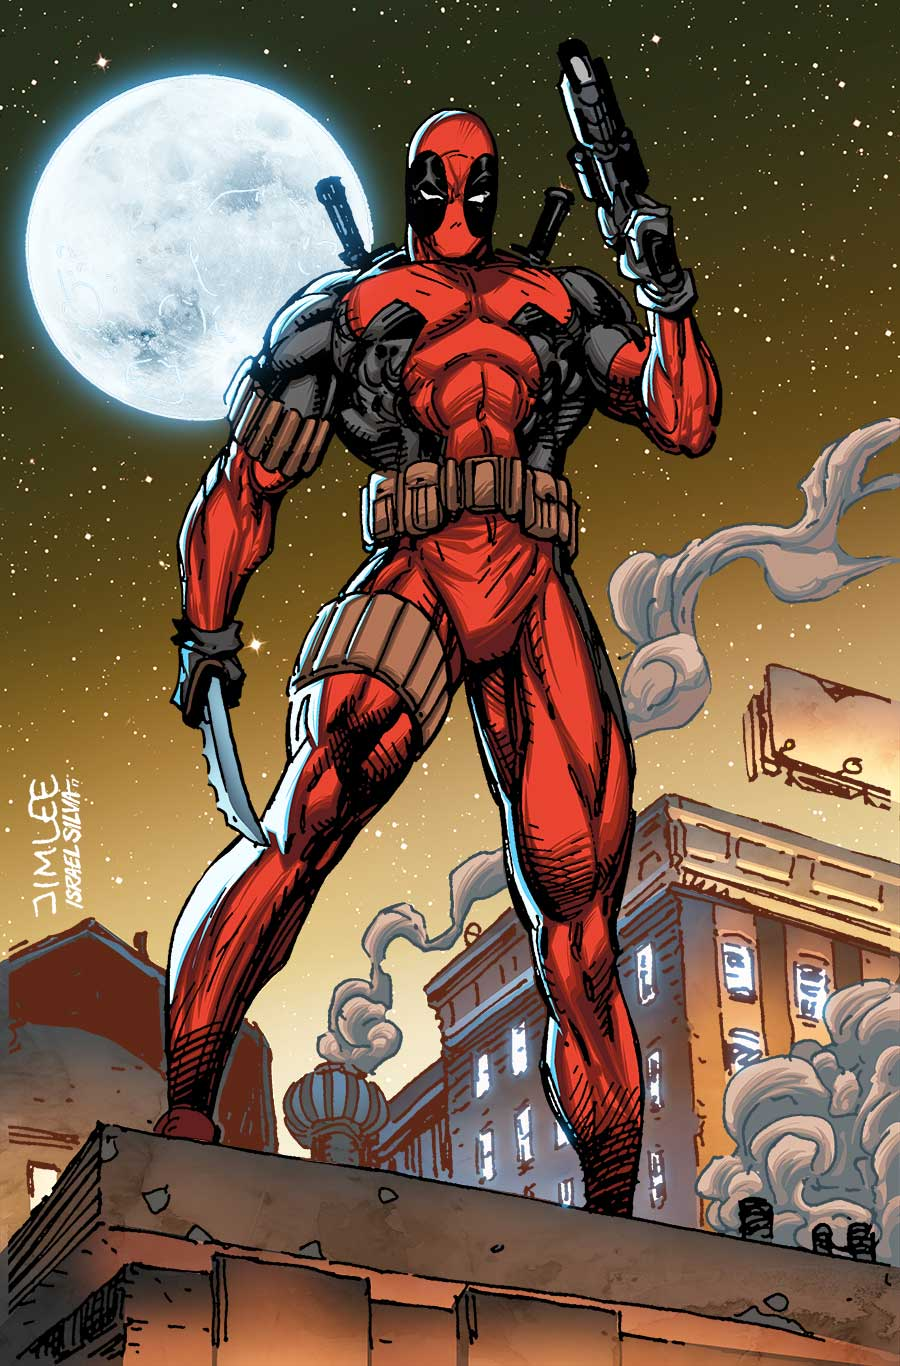 Deadpool_33_X-Men_Trading_Card_Variant July brings astonishing Jim Lee X-MEN TRADING CARD VARIANT COVERS